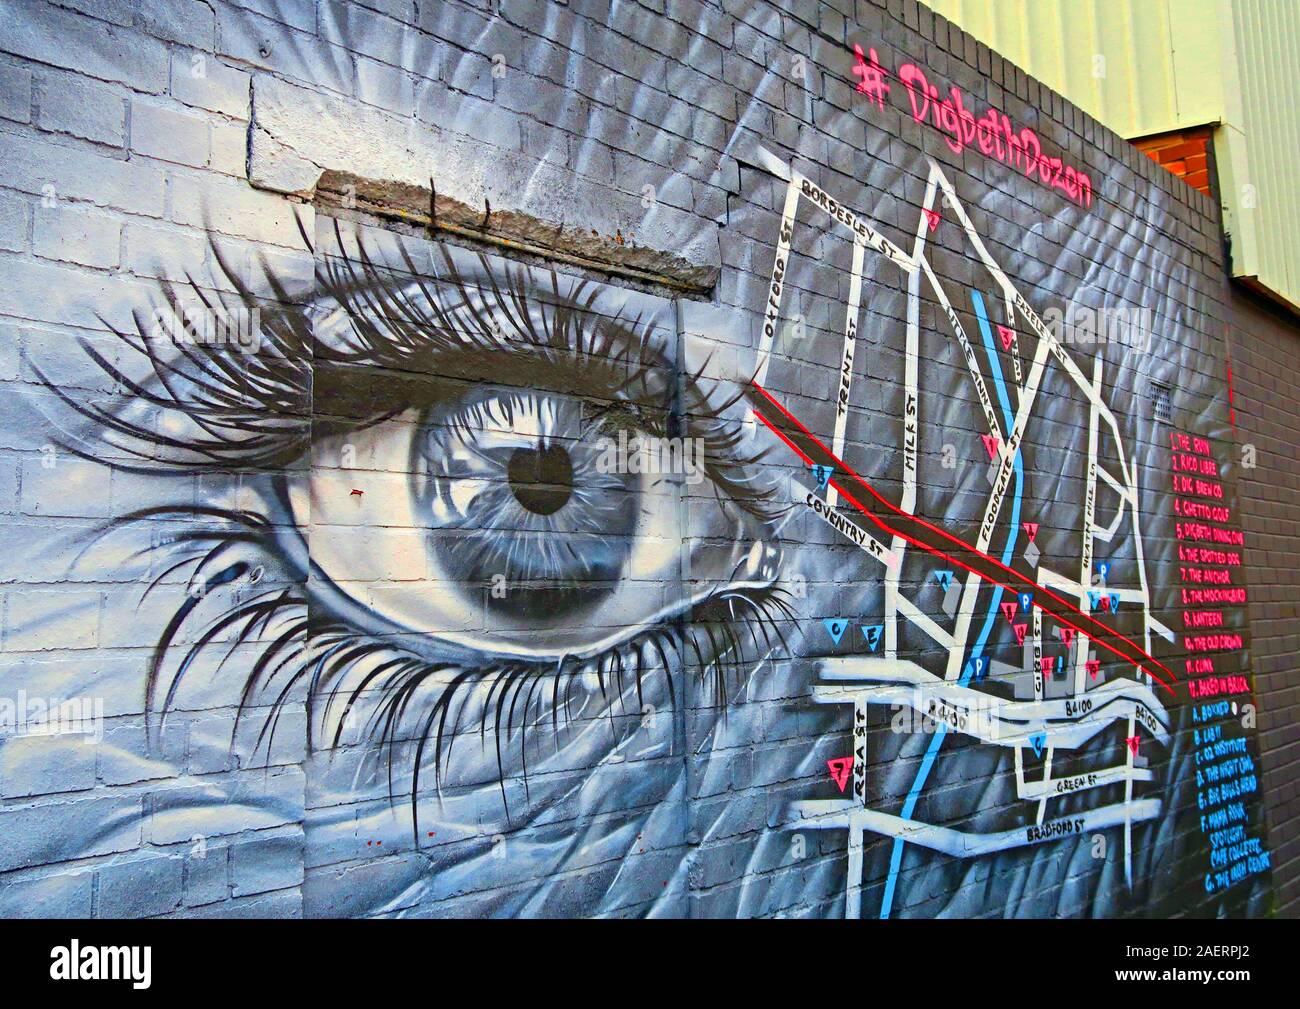 Dieses Stockfoto: Digbeth Dozen, Deep Eye, Graffiti Urban Street Art, in Floodgate St, Digbeth, Bordesley & Highgate, Birmingham, West Midlands, England, Großbritannien, B5 5ST - 2AERPJ